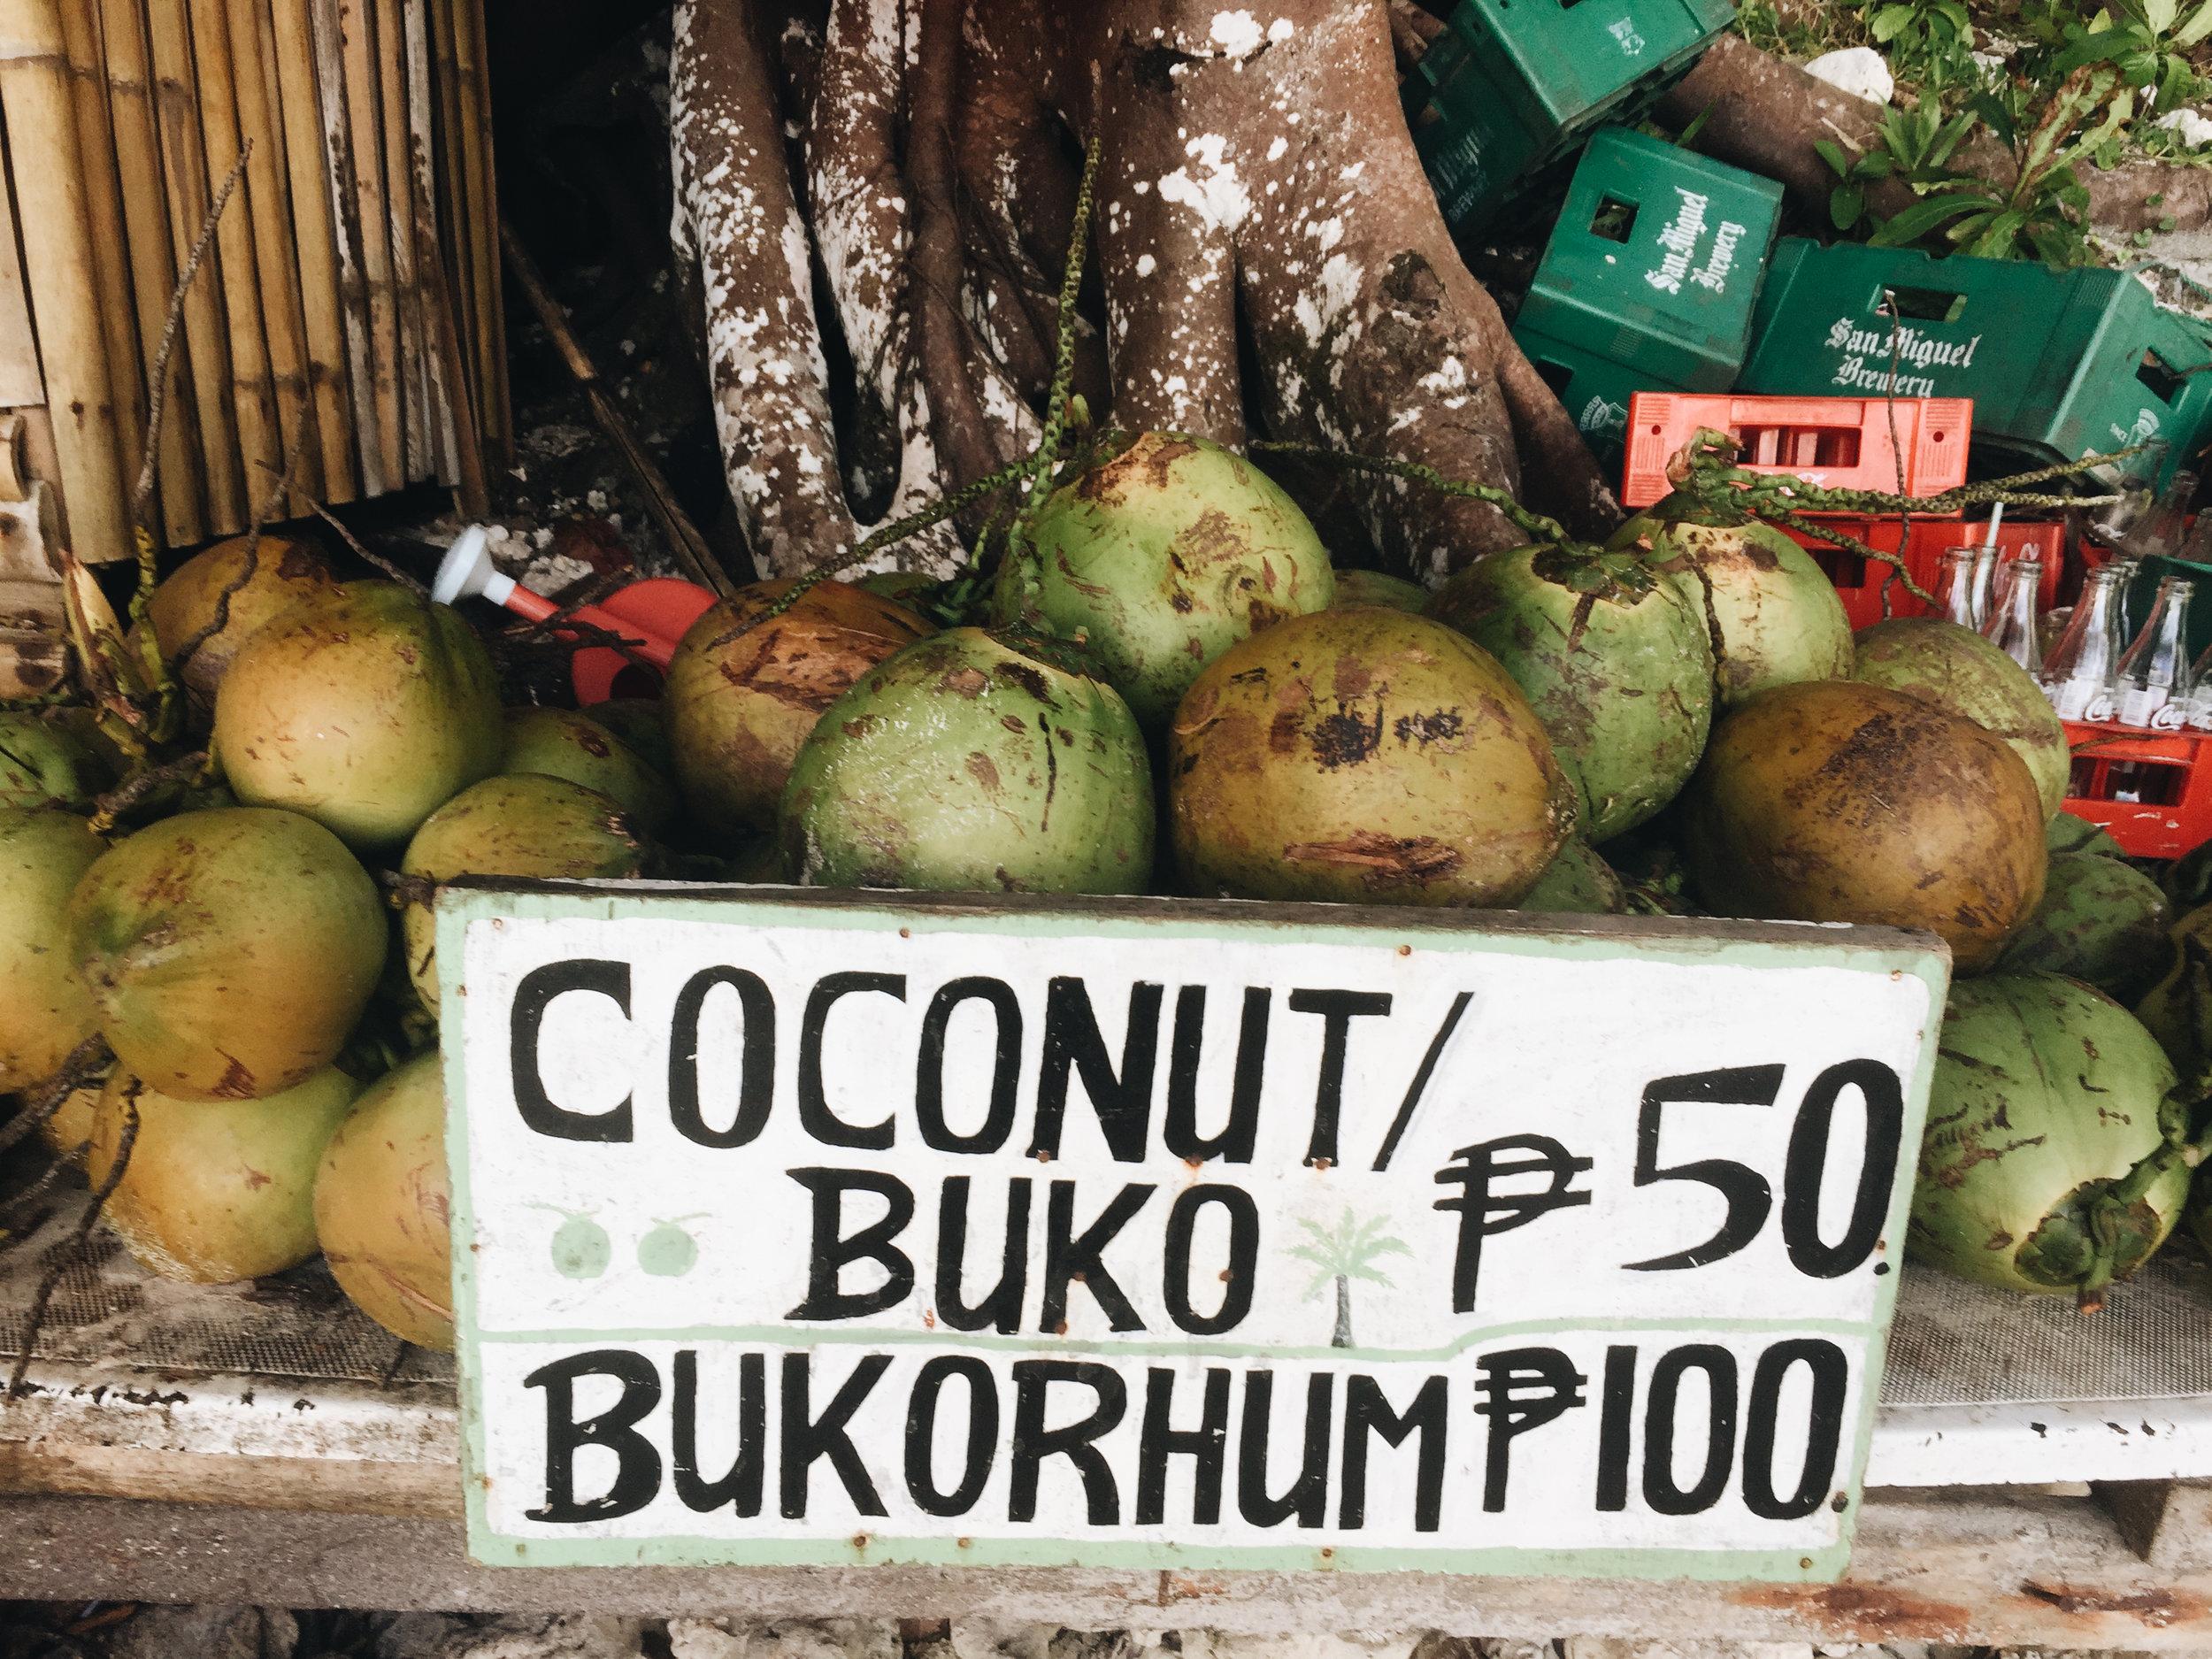 Coconut & Buko